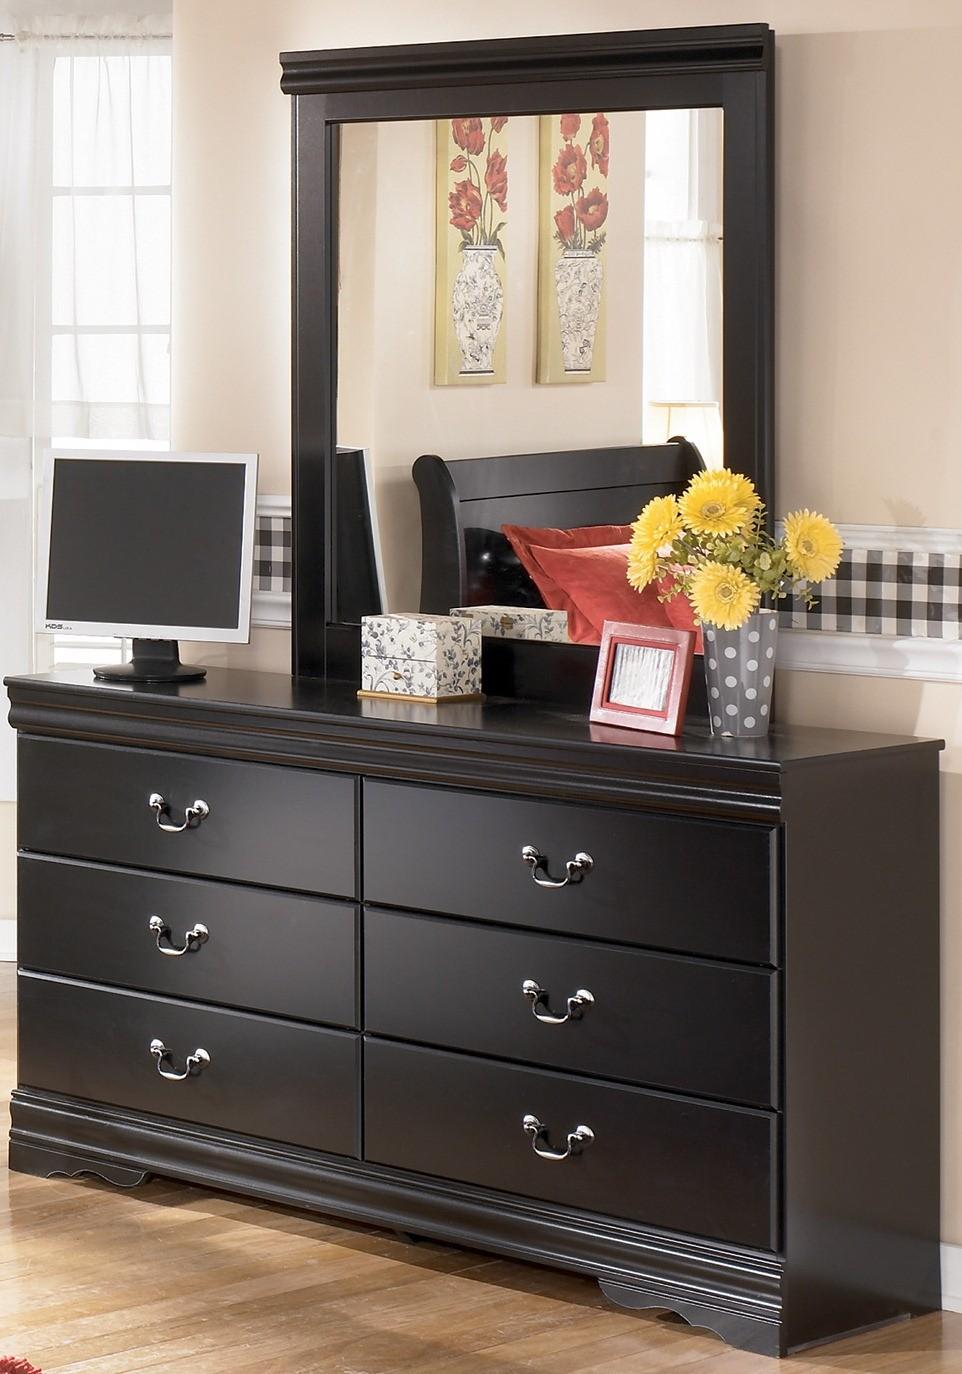 Huey Vineyard Bedroom Set From Ashley B128 77 74 98